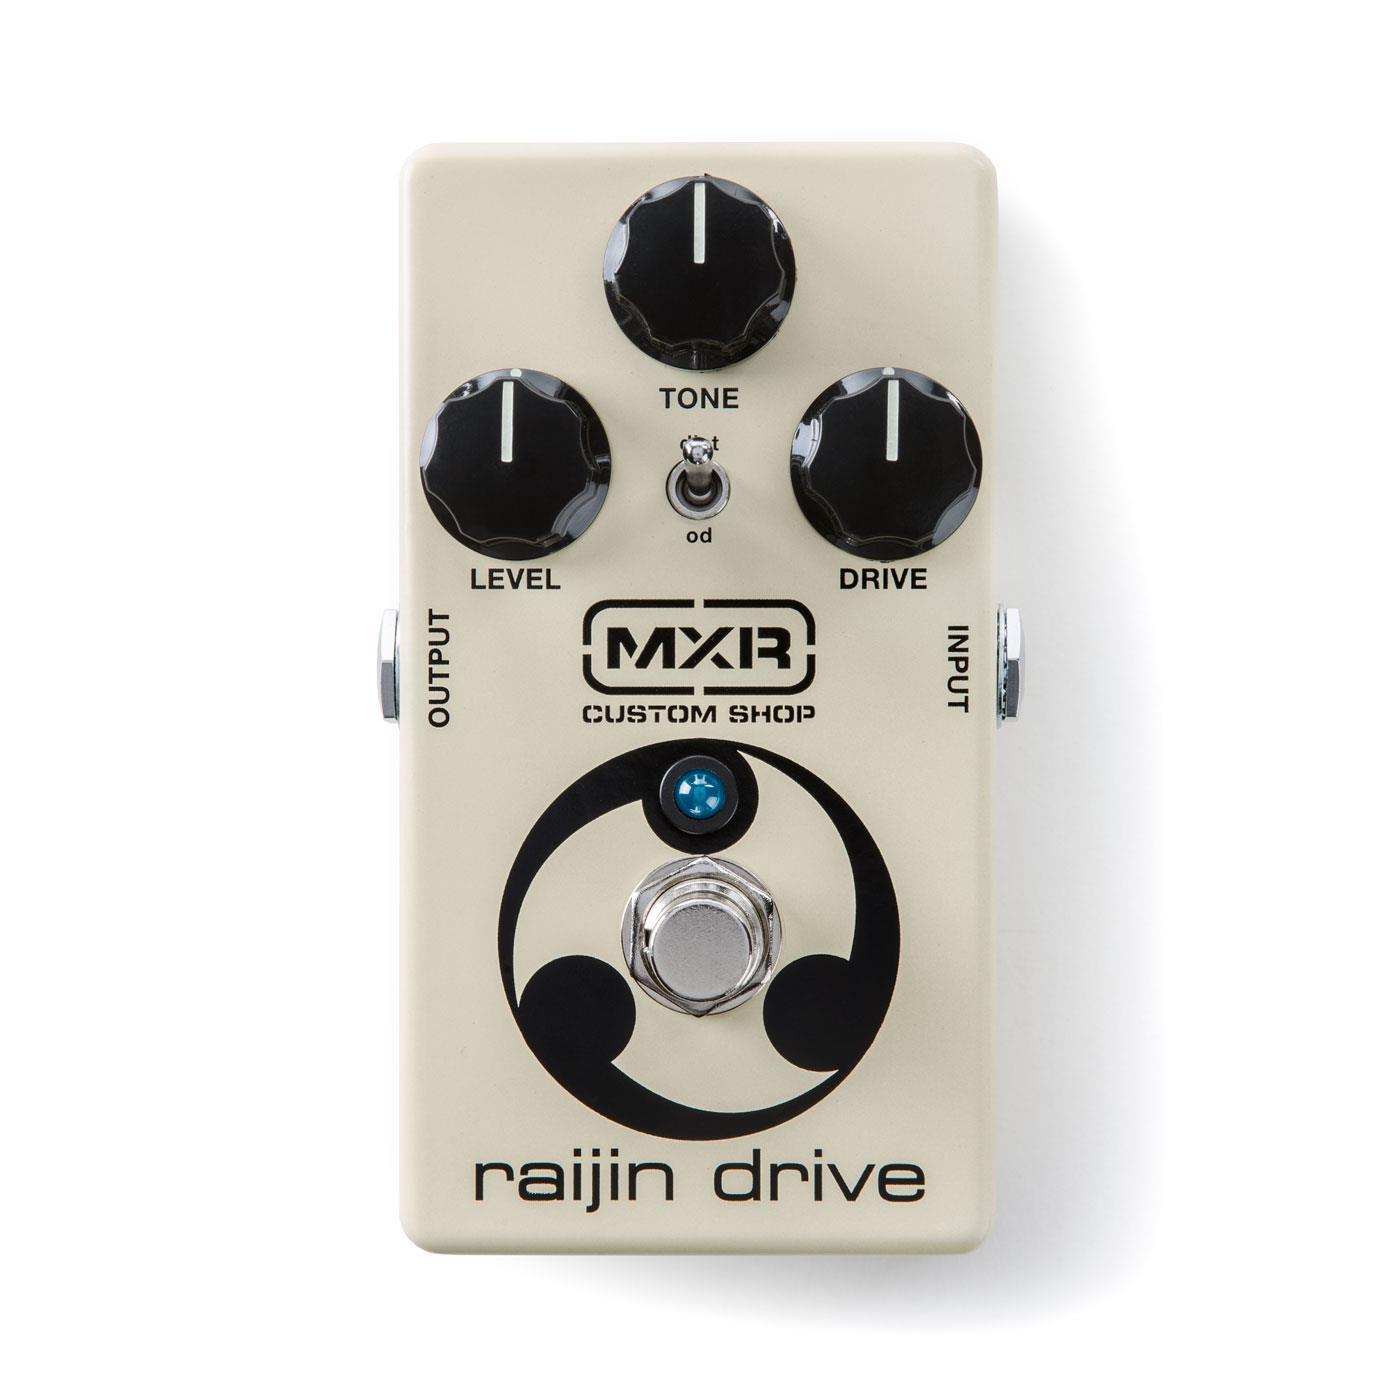 MXR Custom Shop CSP-037 Raijin Drive Overdrive pedal